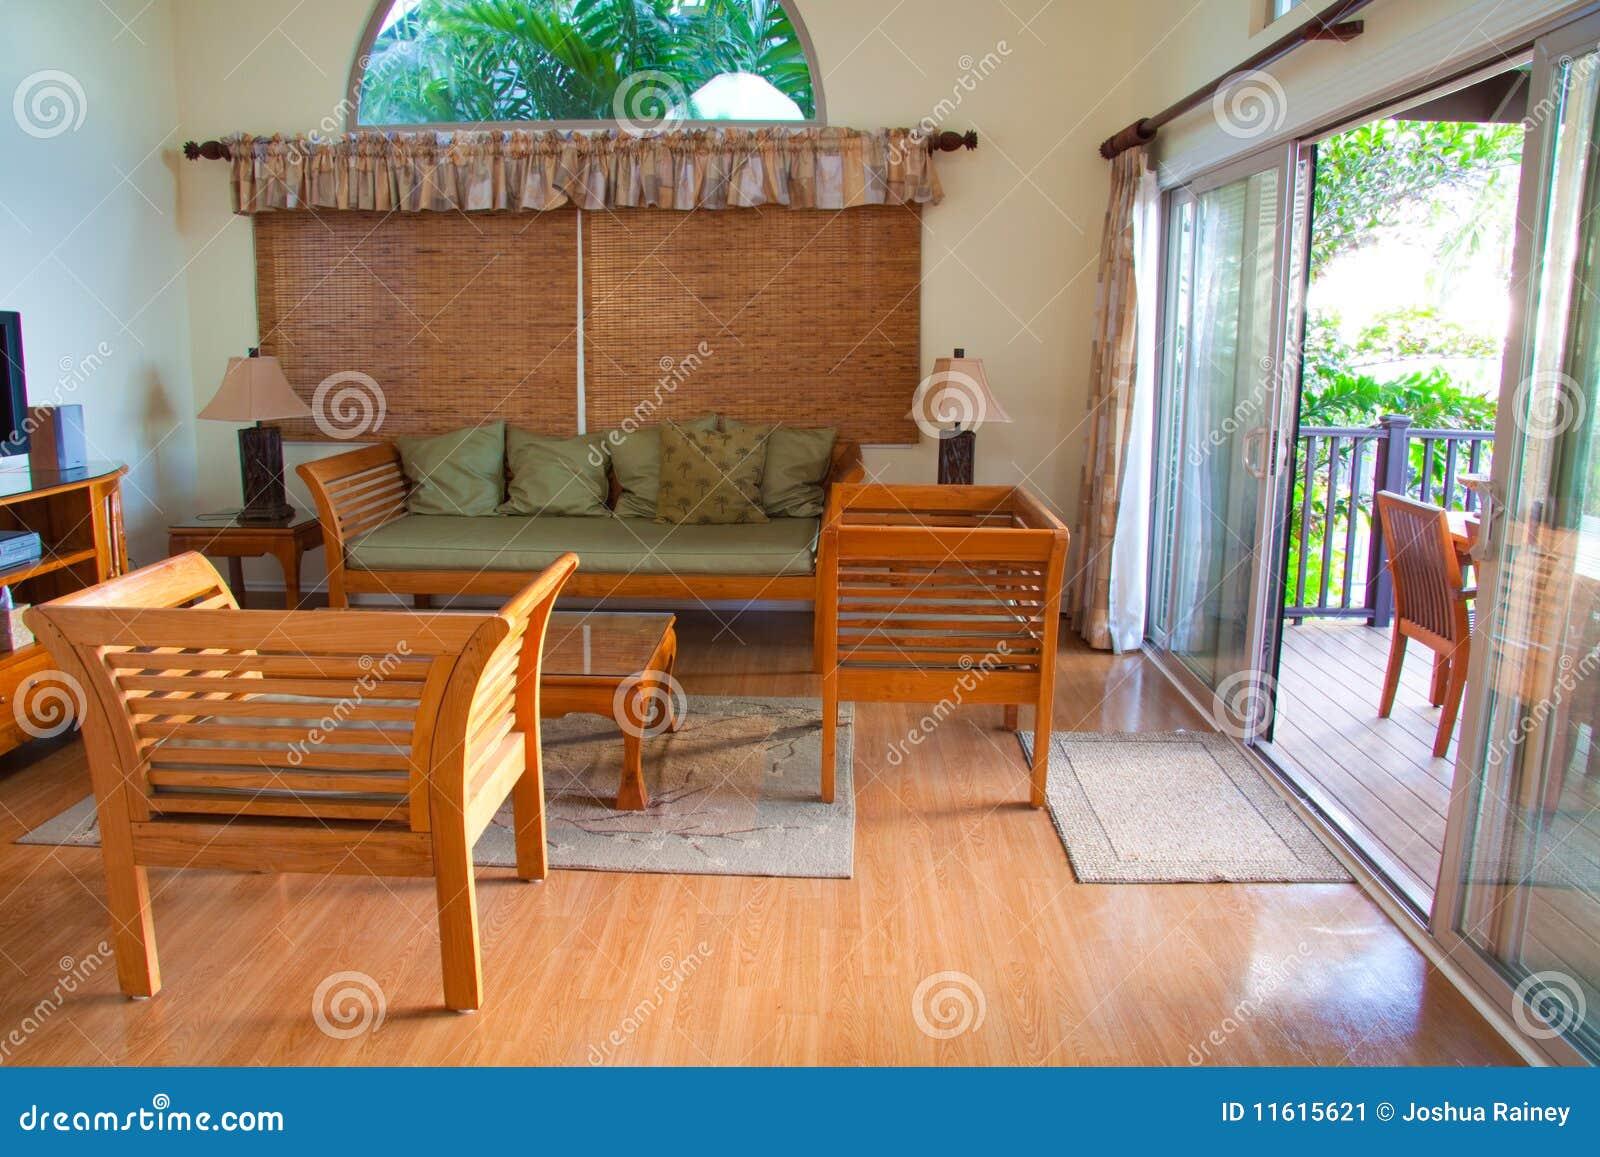 Hawaiian House Decor stock image. Image of rental